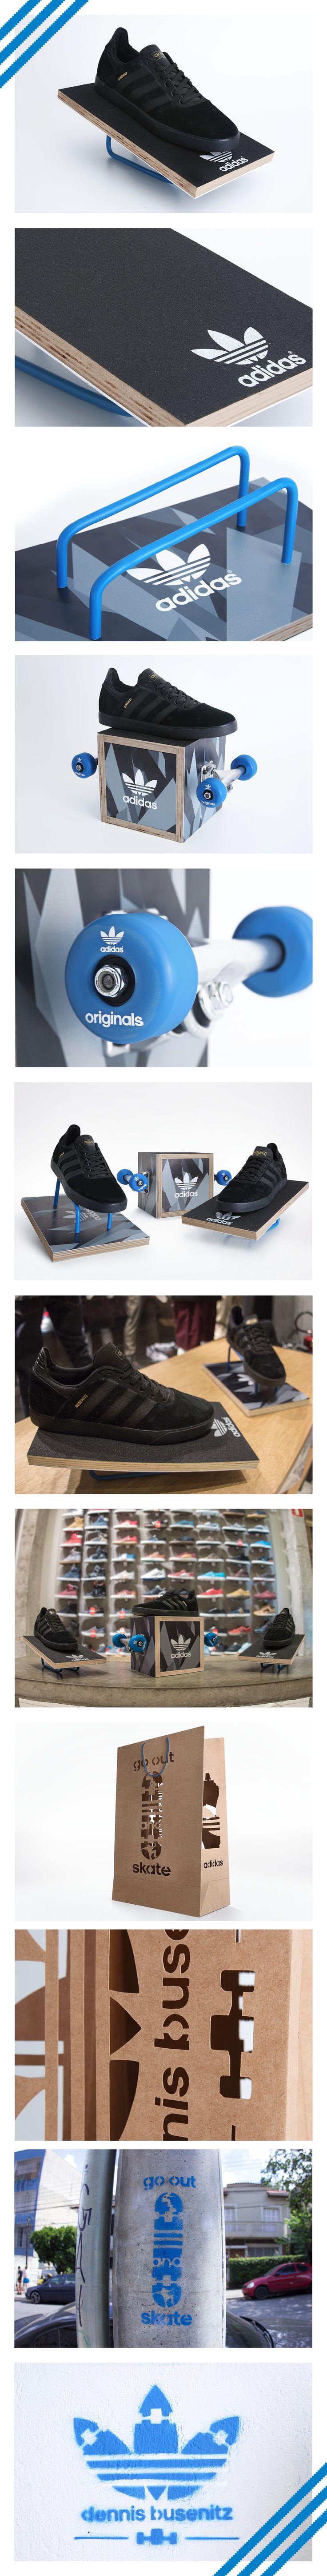 P.O.P Visual Merchandisign #retail #skateboard #adidasskateboarding #busenitz #adidasoriginals #promotional #thisisretail